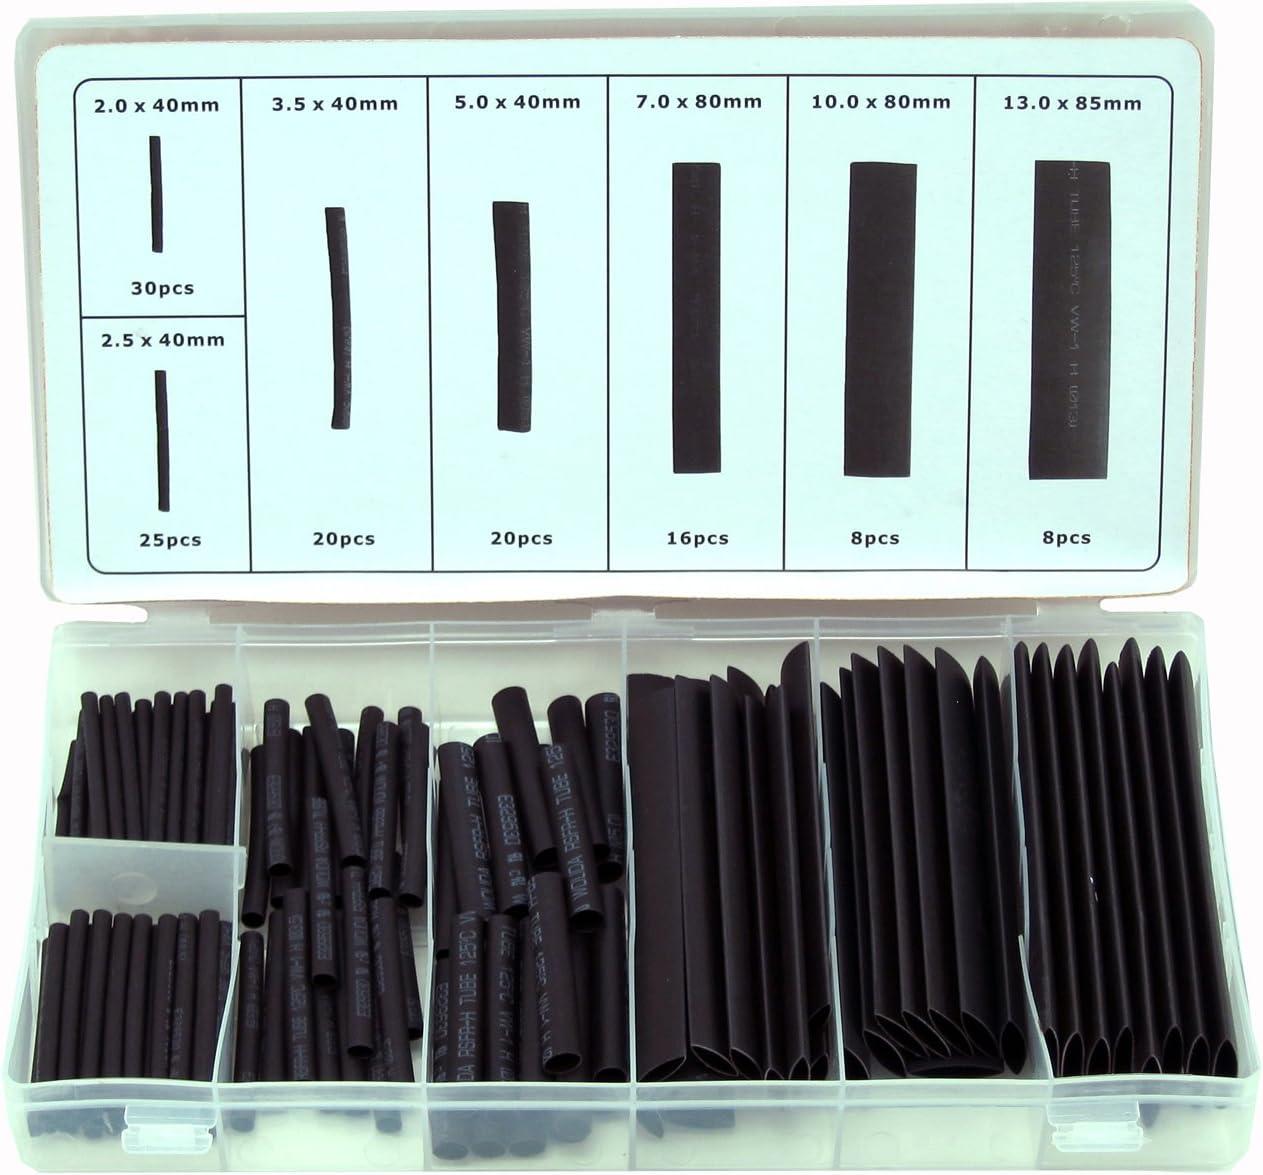 Elitexion 127 Super beauty product restock quality top Pc Max 78% OFF Heat Shrink Wire Tubing Ele Assortment Set Wrap